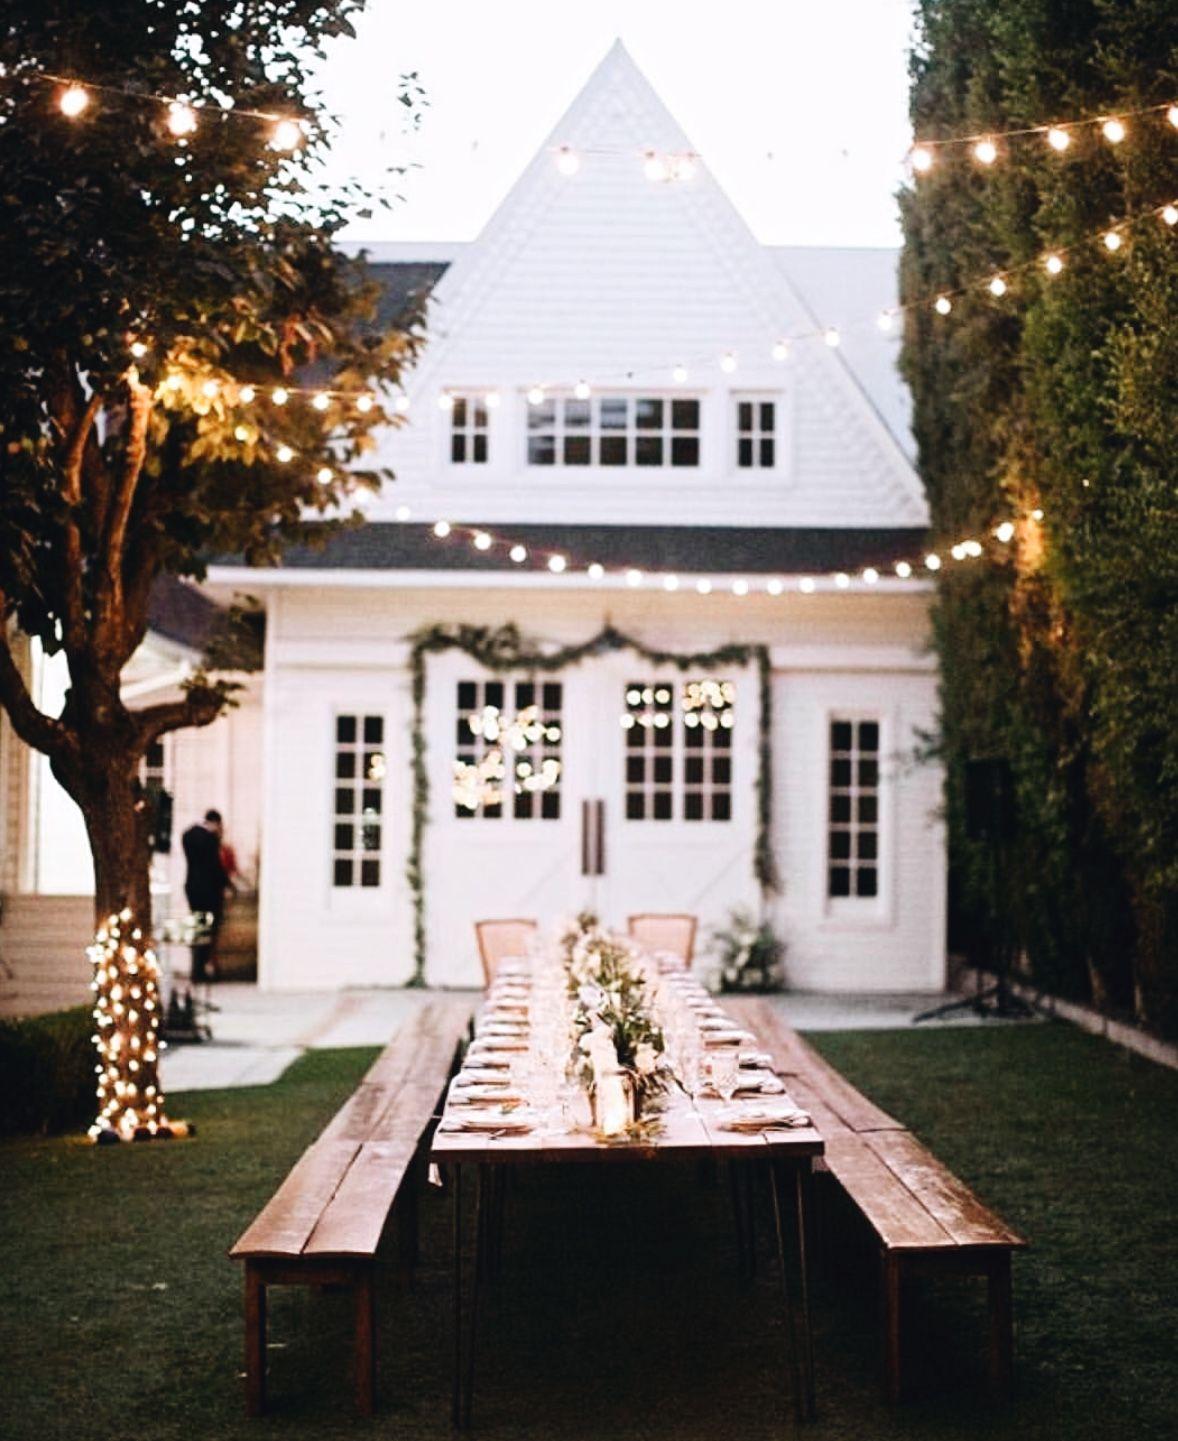 Home wedding decor ideas  Pin by Klarissa Stanly on Home ideas  Pinterest  Future Wedding